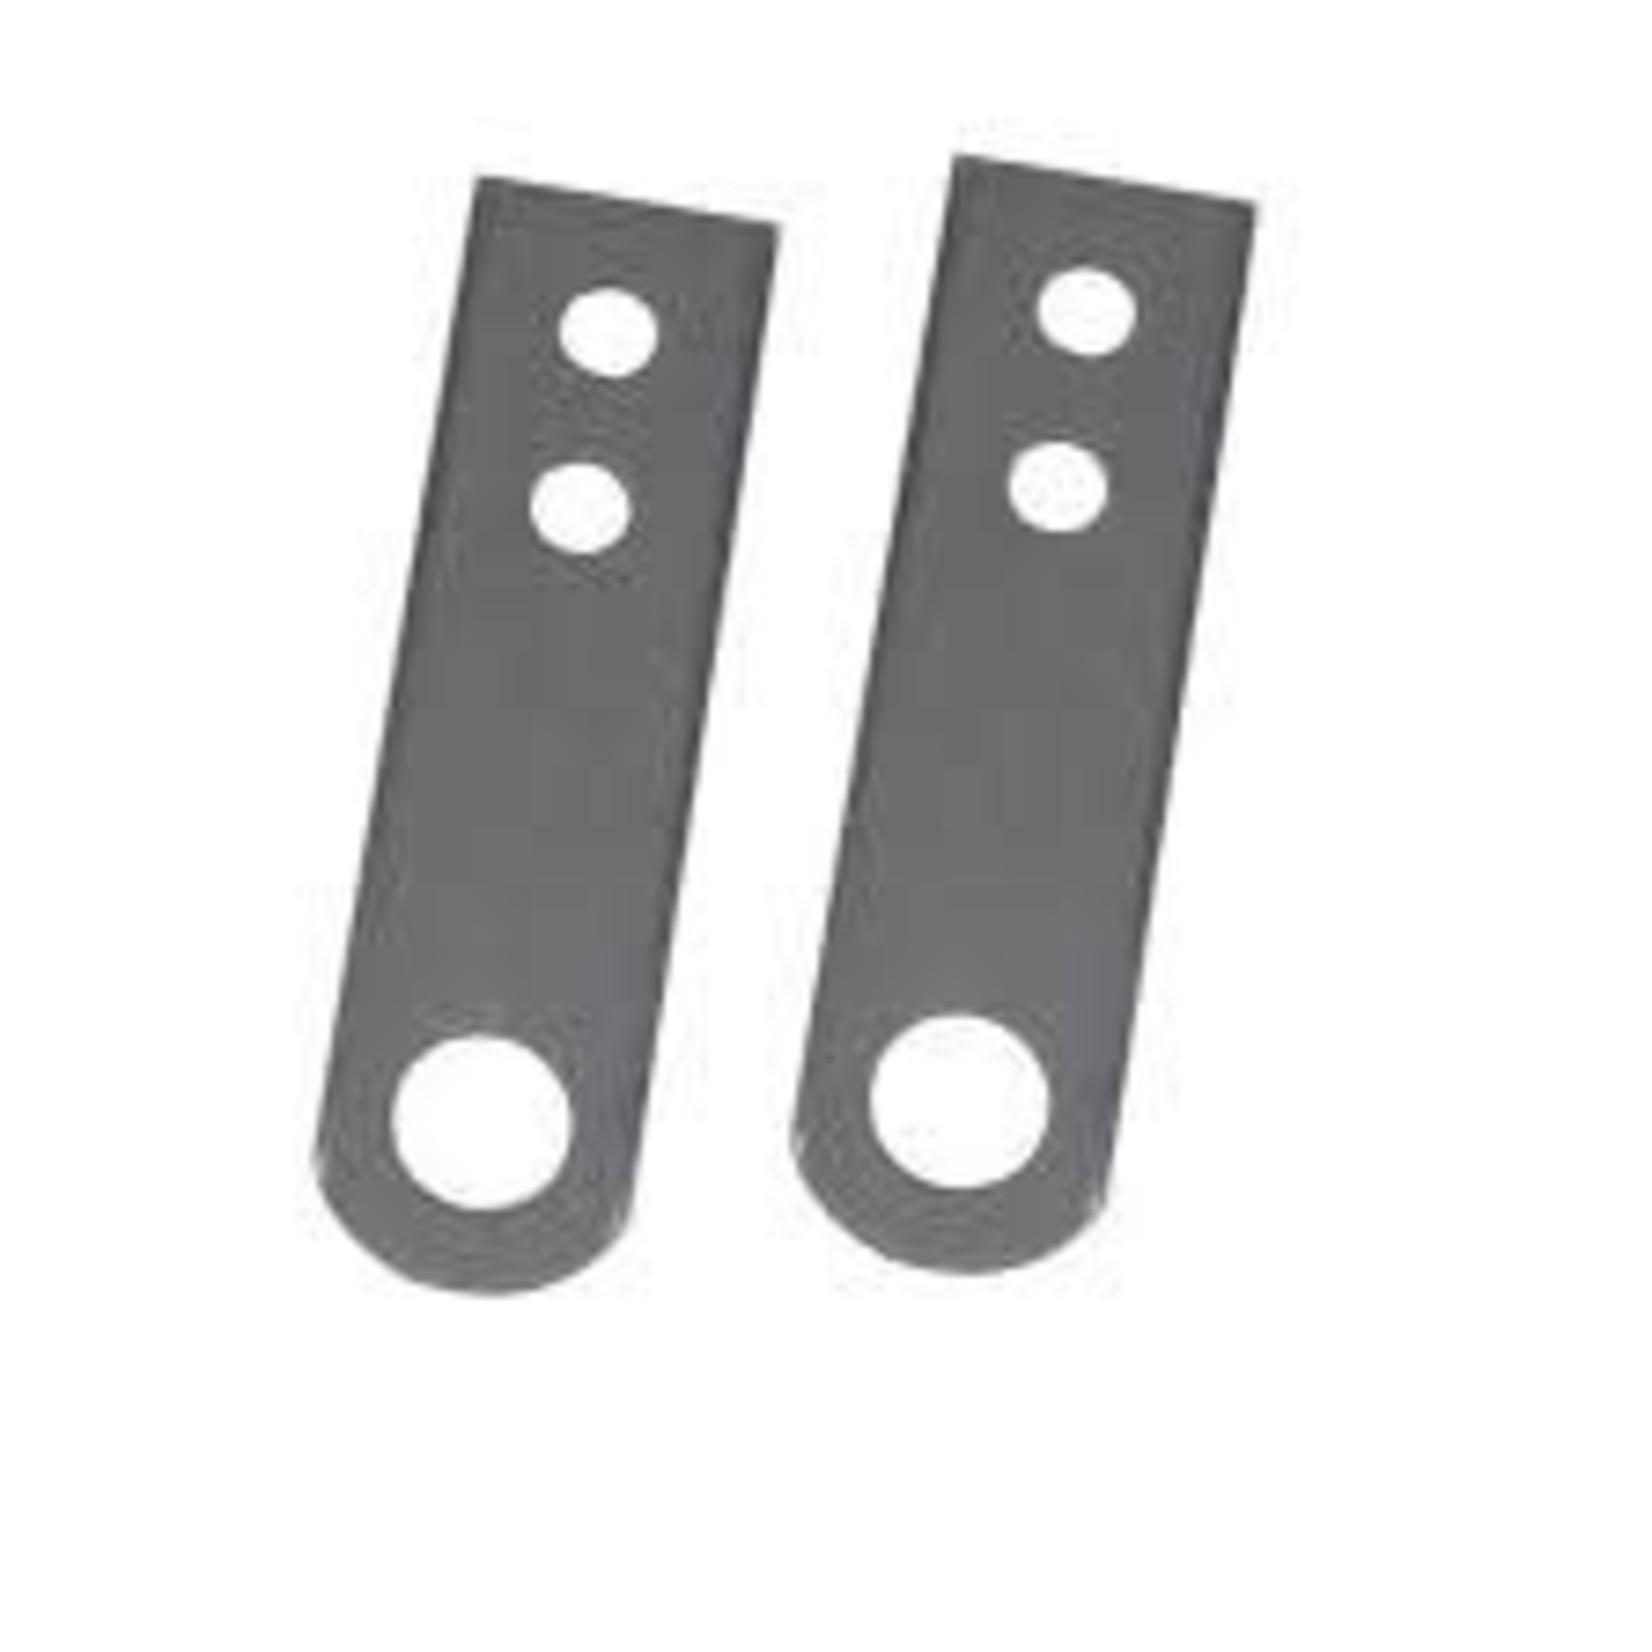 "NICSON 7"" 2-HOLE 3/16""HD STEEL HANGER STRAP"